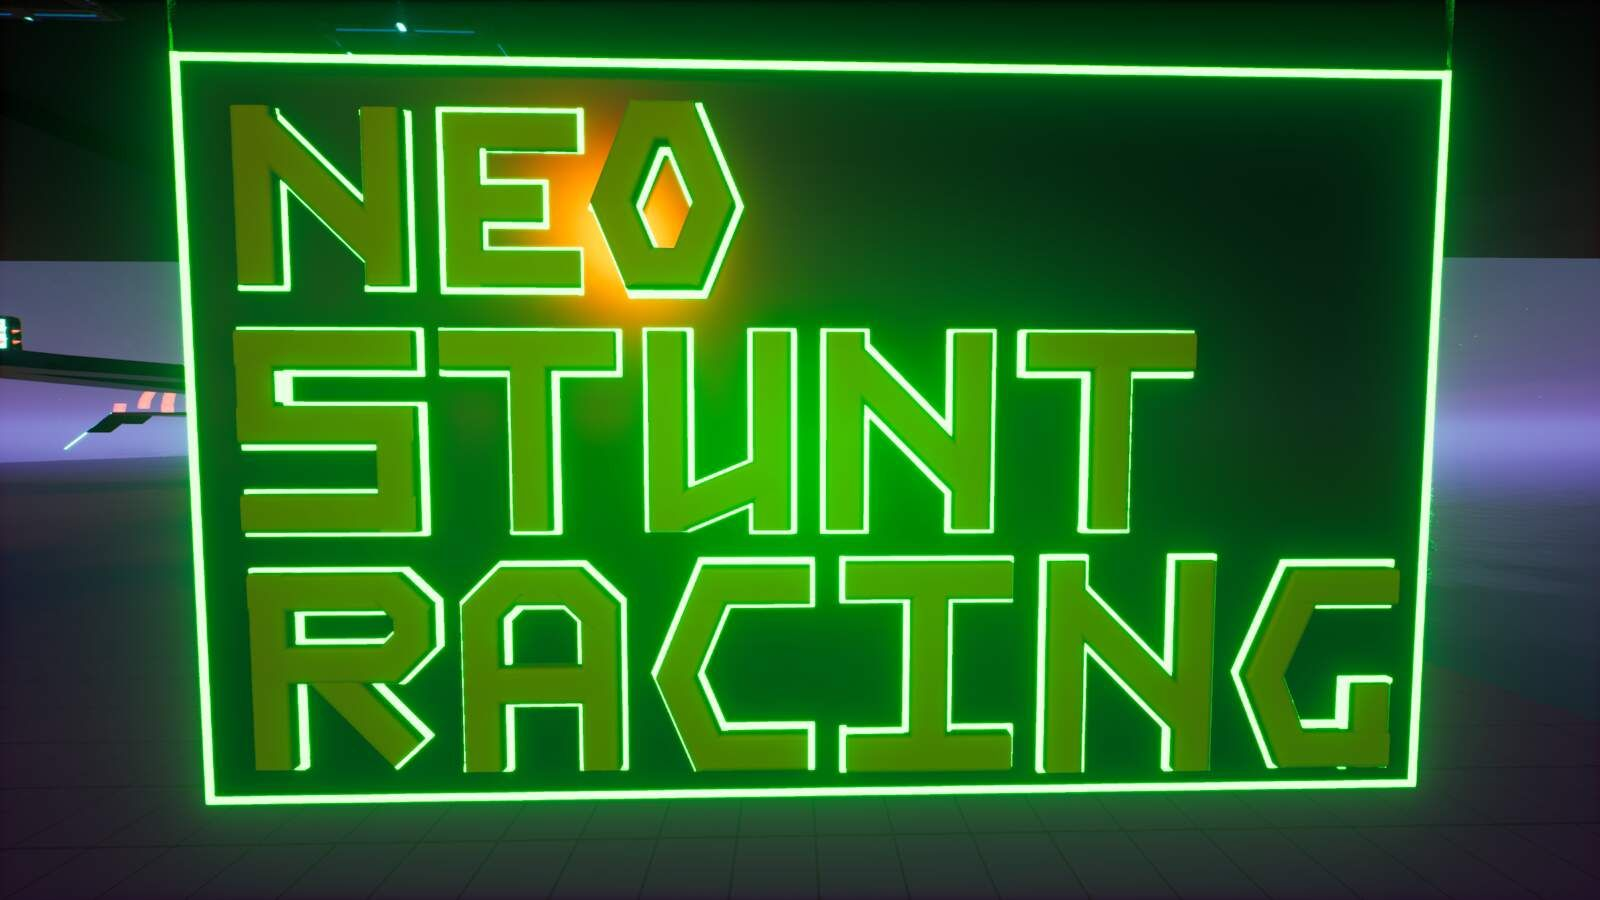 Neo Stunt Racing 9047-5011-5233 by mtl_rellik